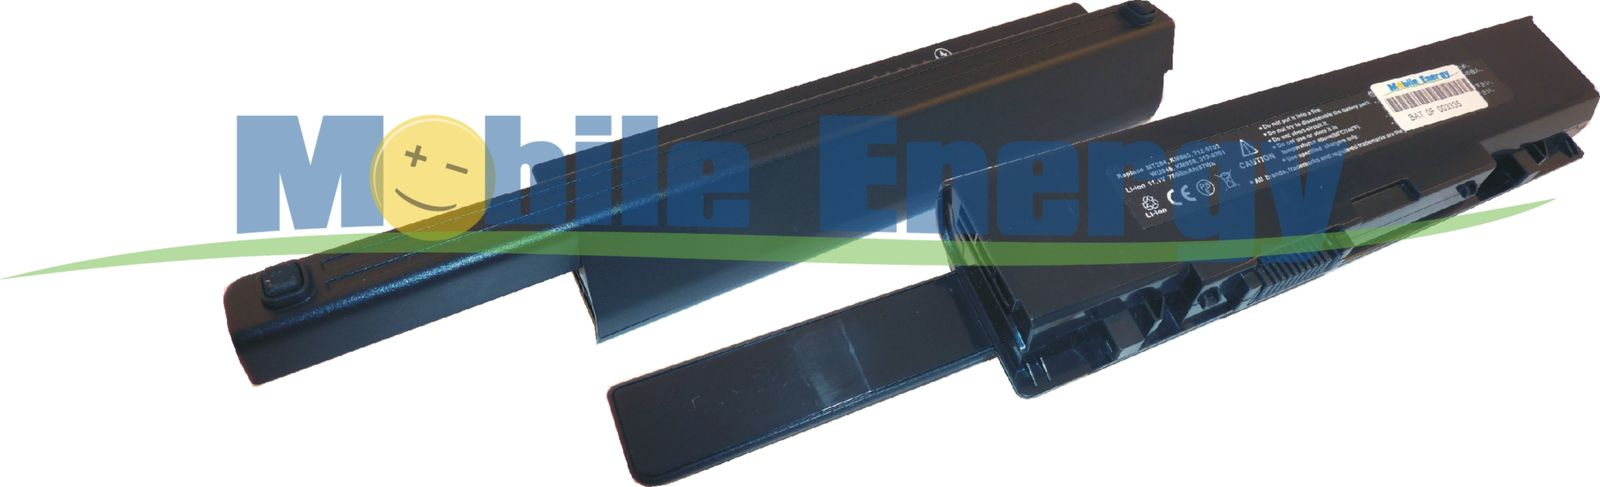 Mobile-Energy Baterie DELL Studio 15 / Studio 1535 / Studio 1536